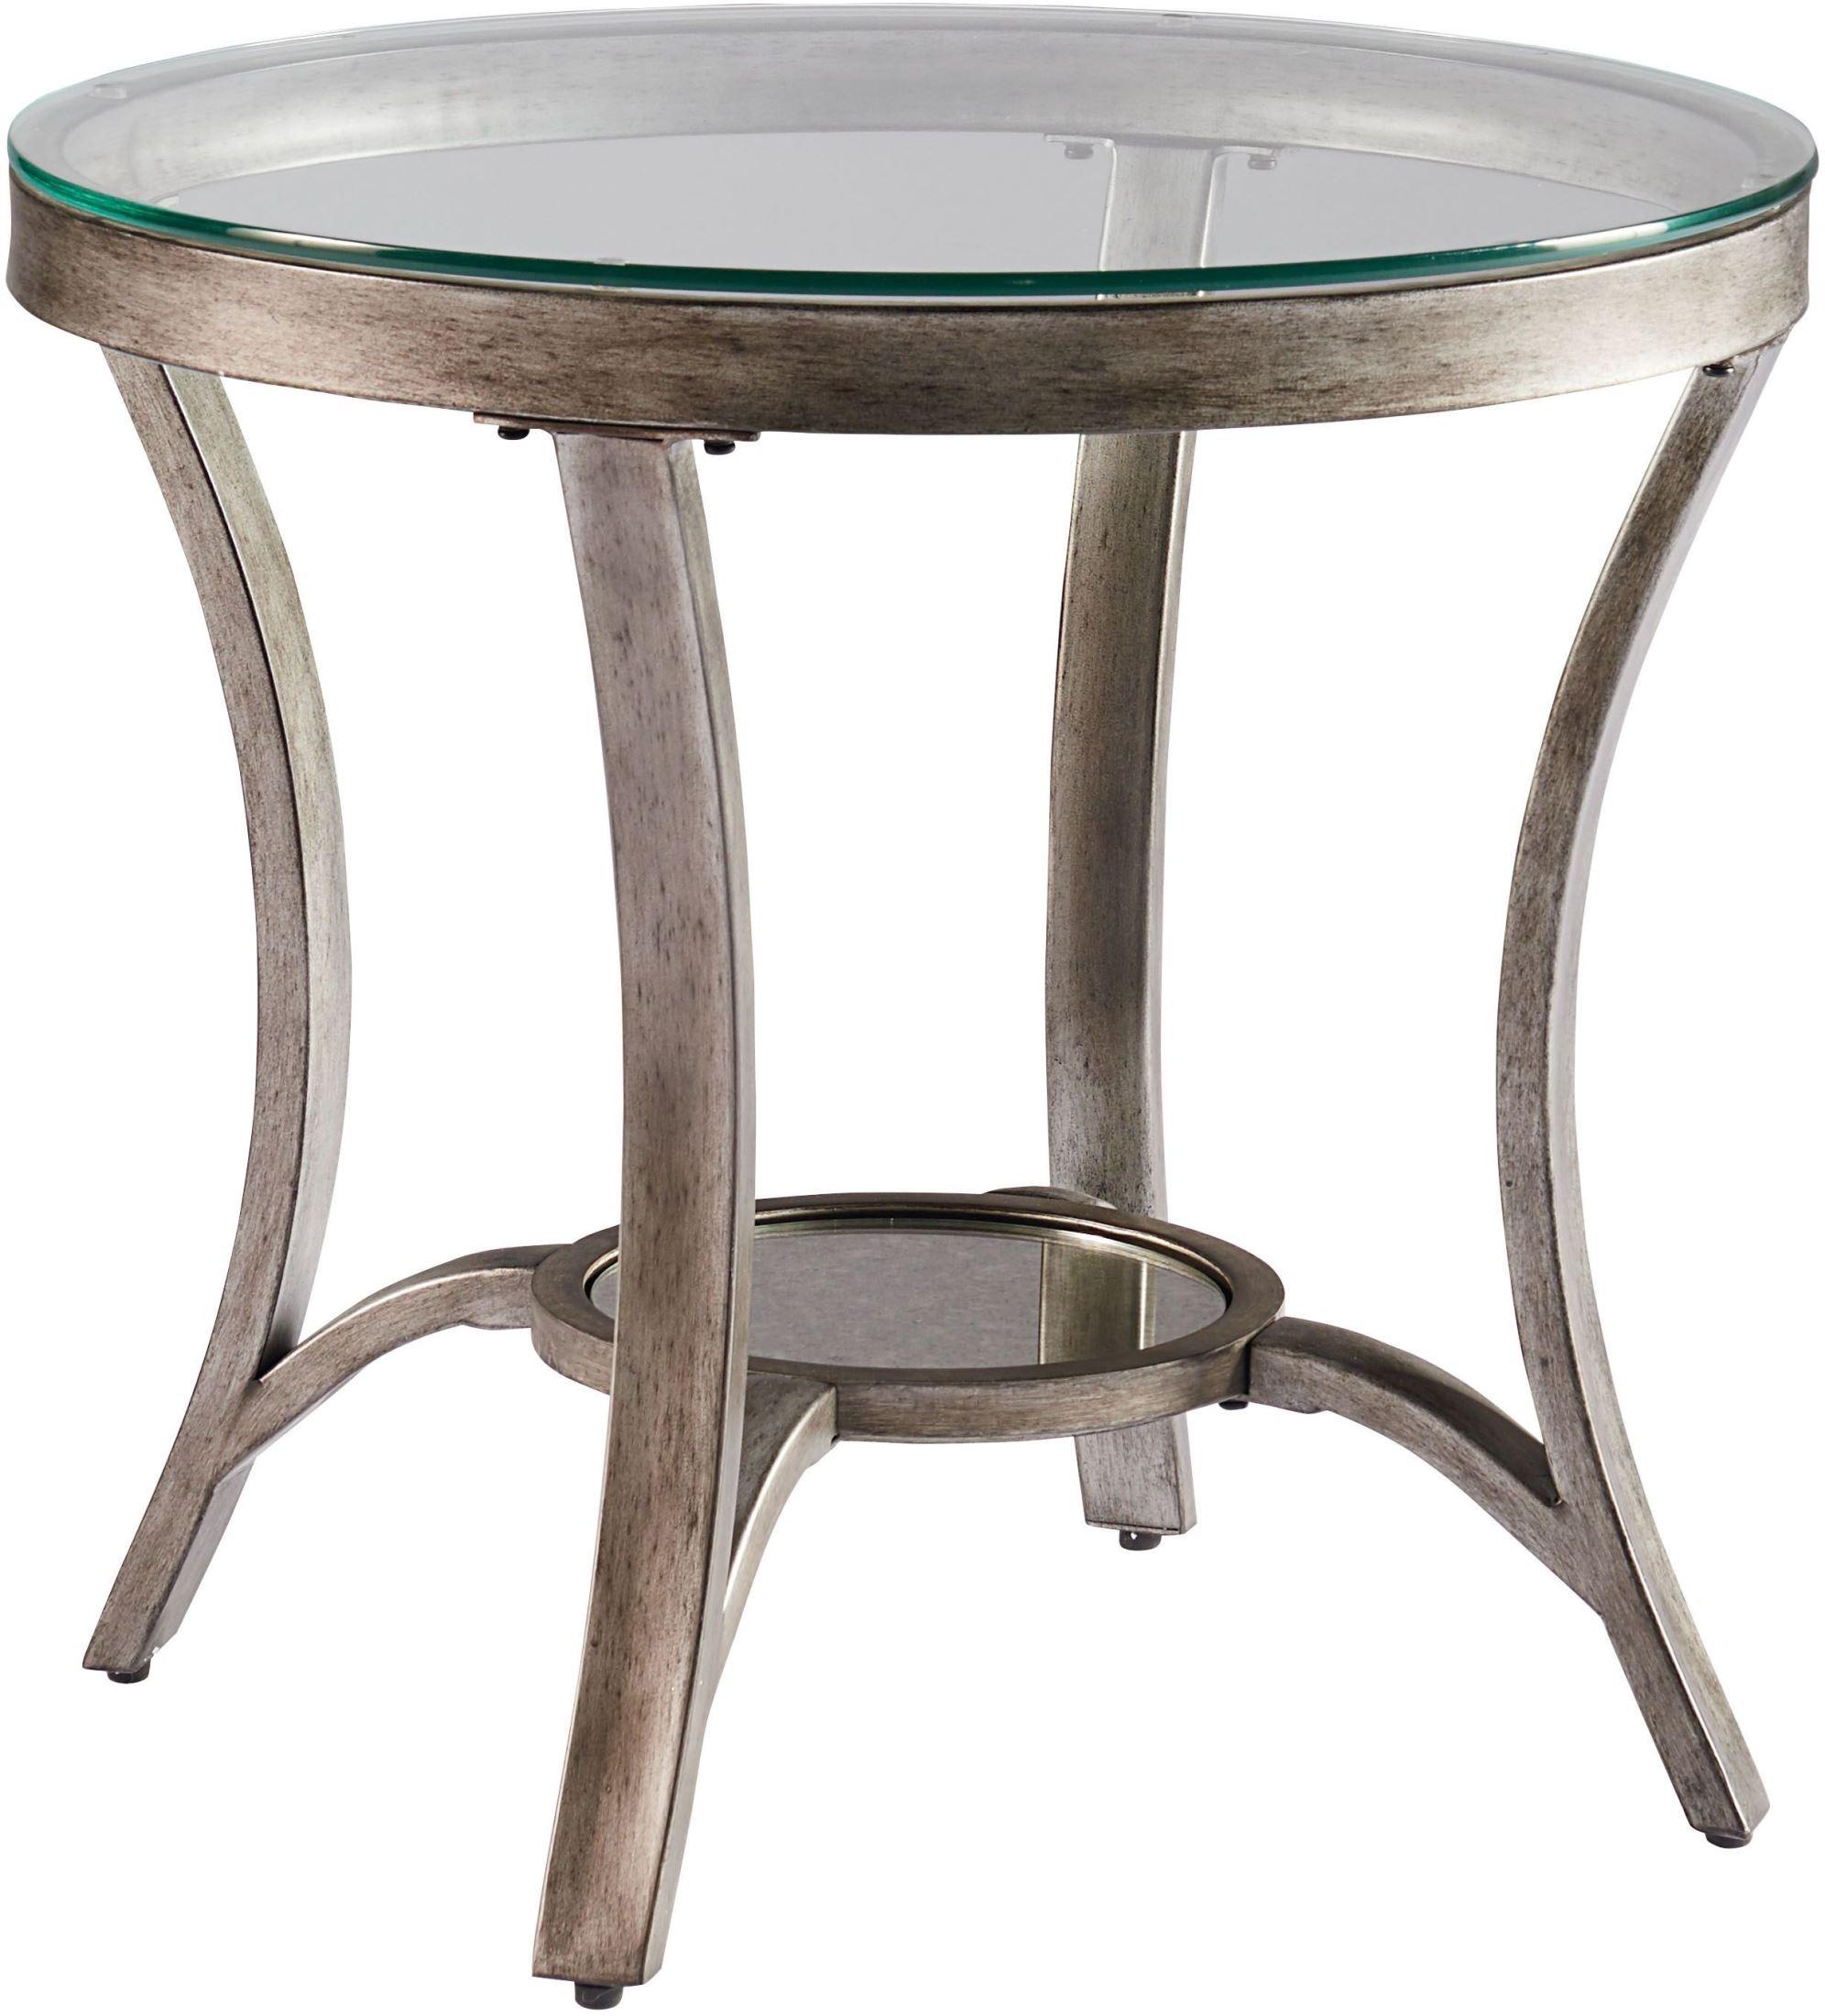 cole champagne metal end table from standard furniture coleman furniture. Black Bedroom Furniture Sets. Home Design Ideas